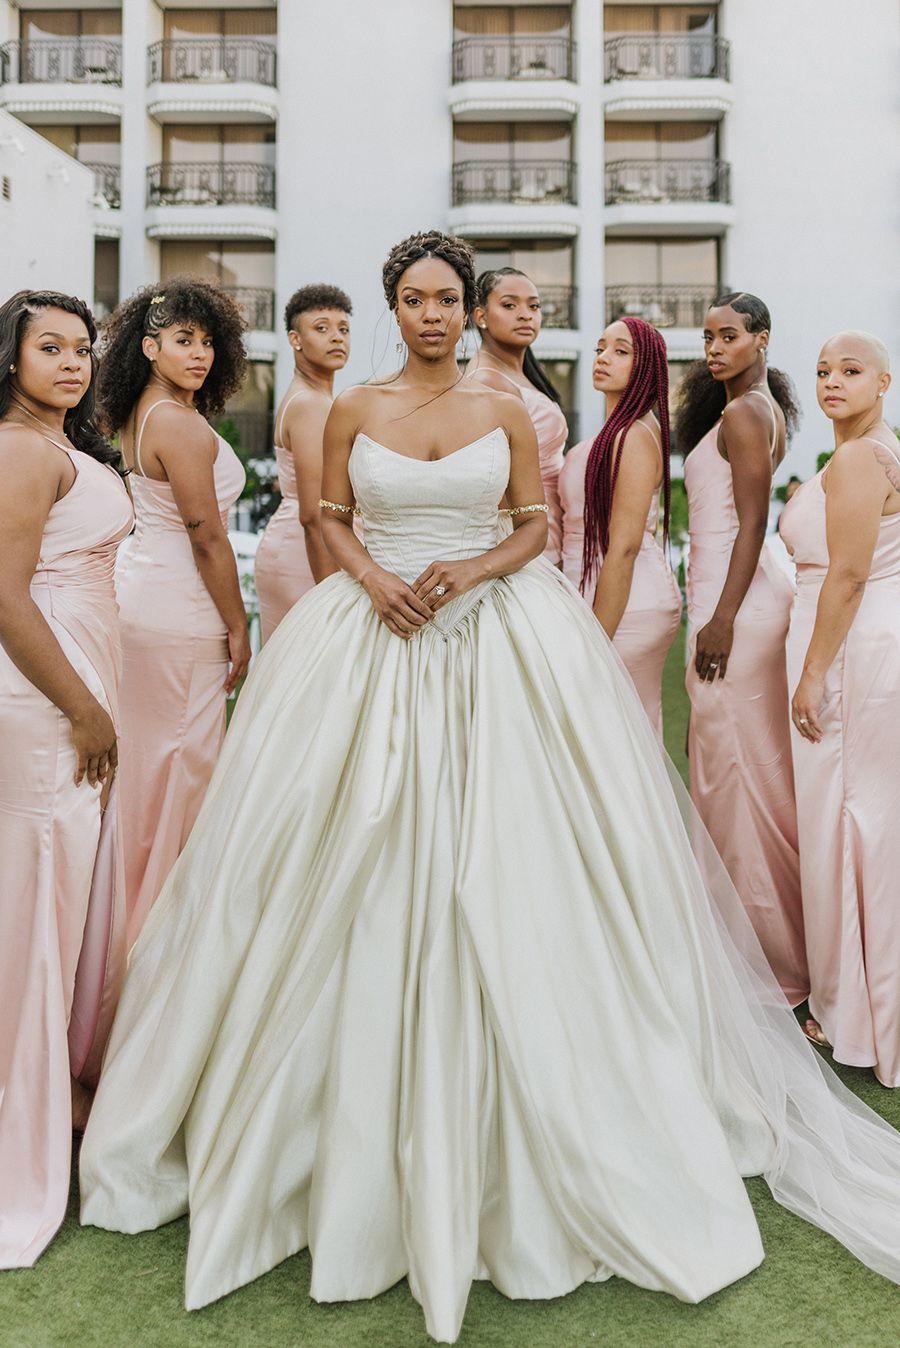 Pin On Beautiful Brides